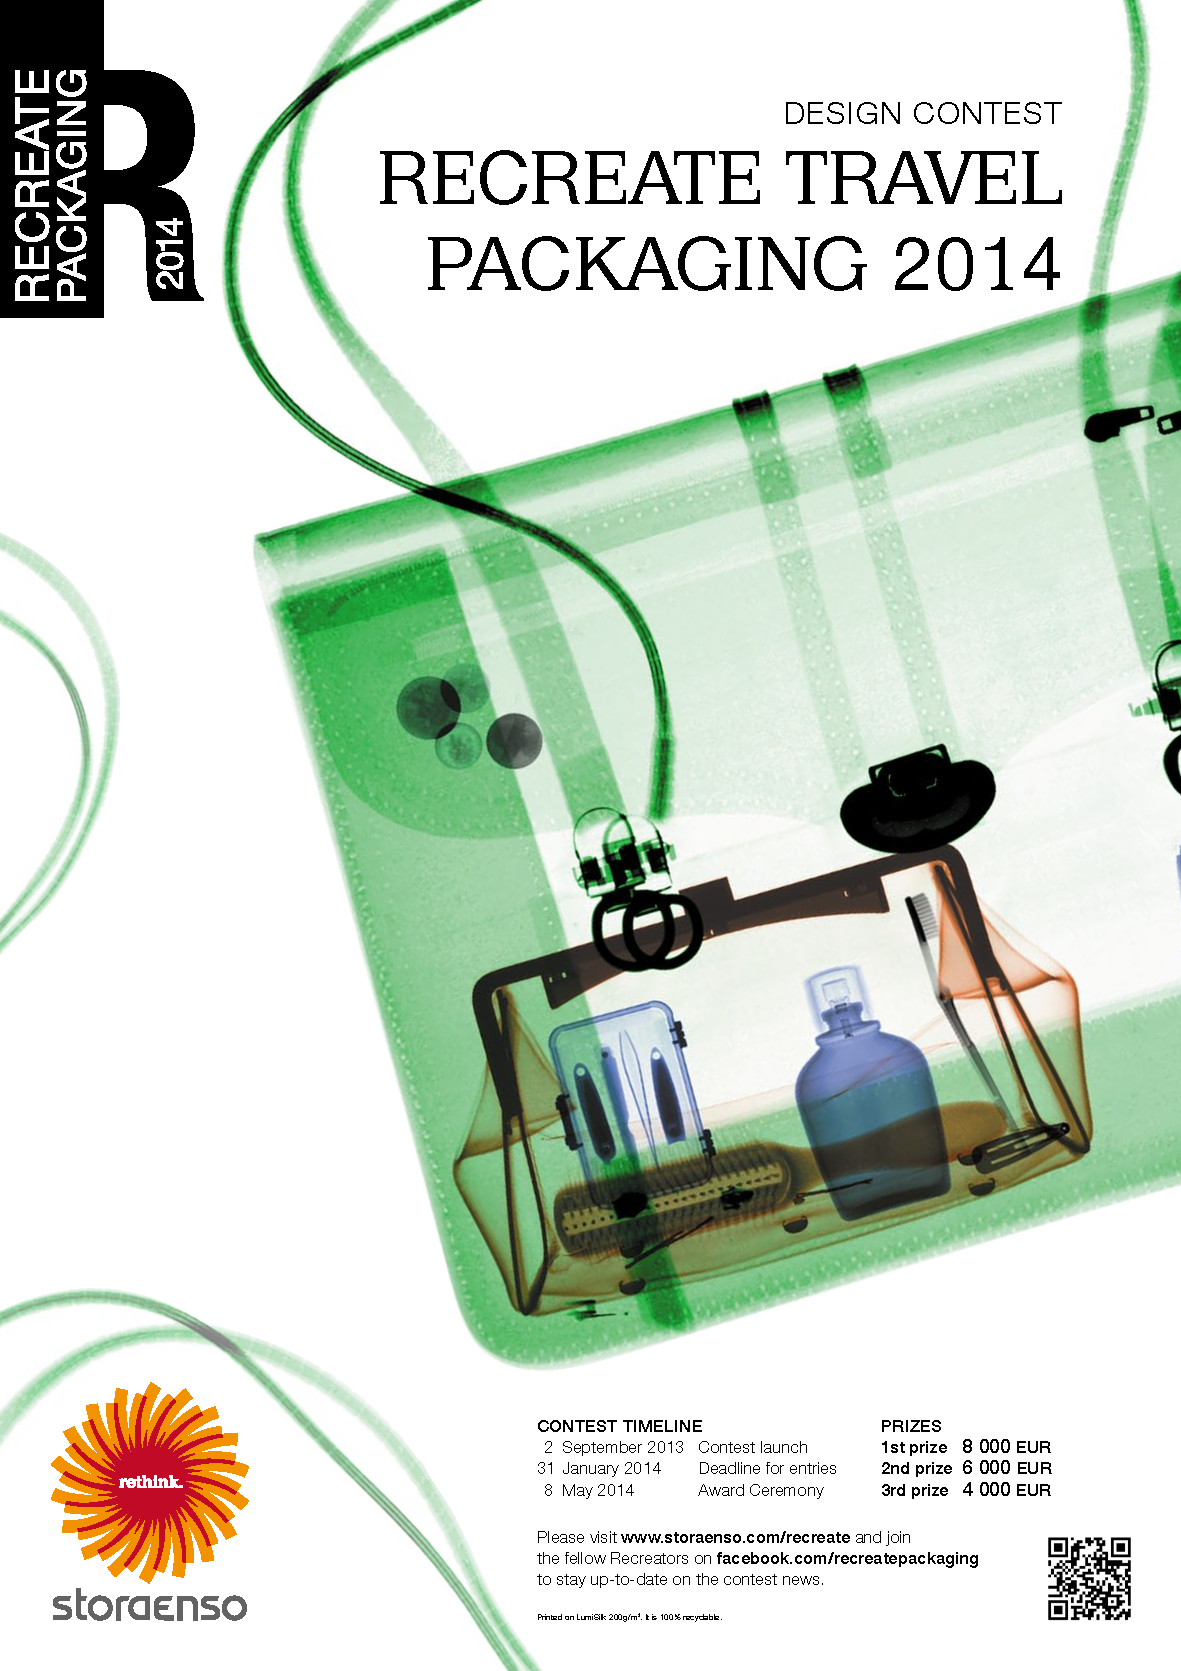 Recreate Travel Packaging Design Contest